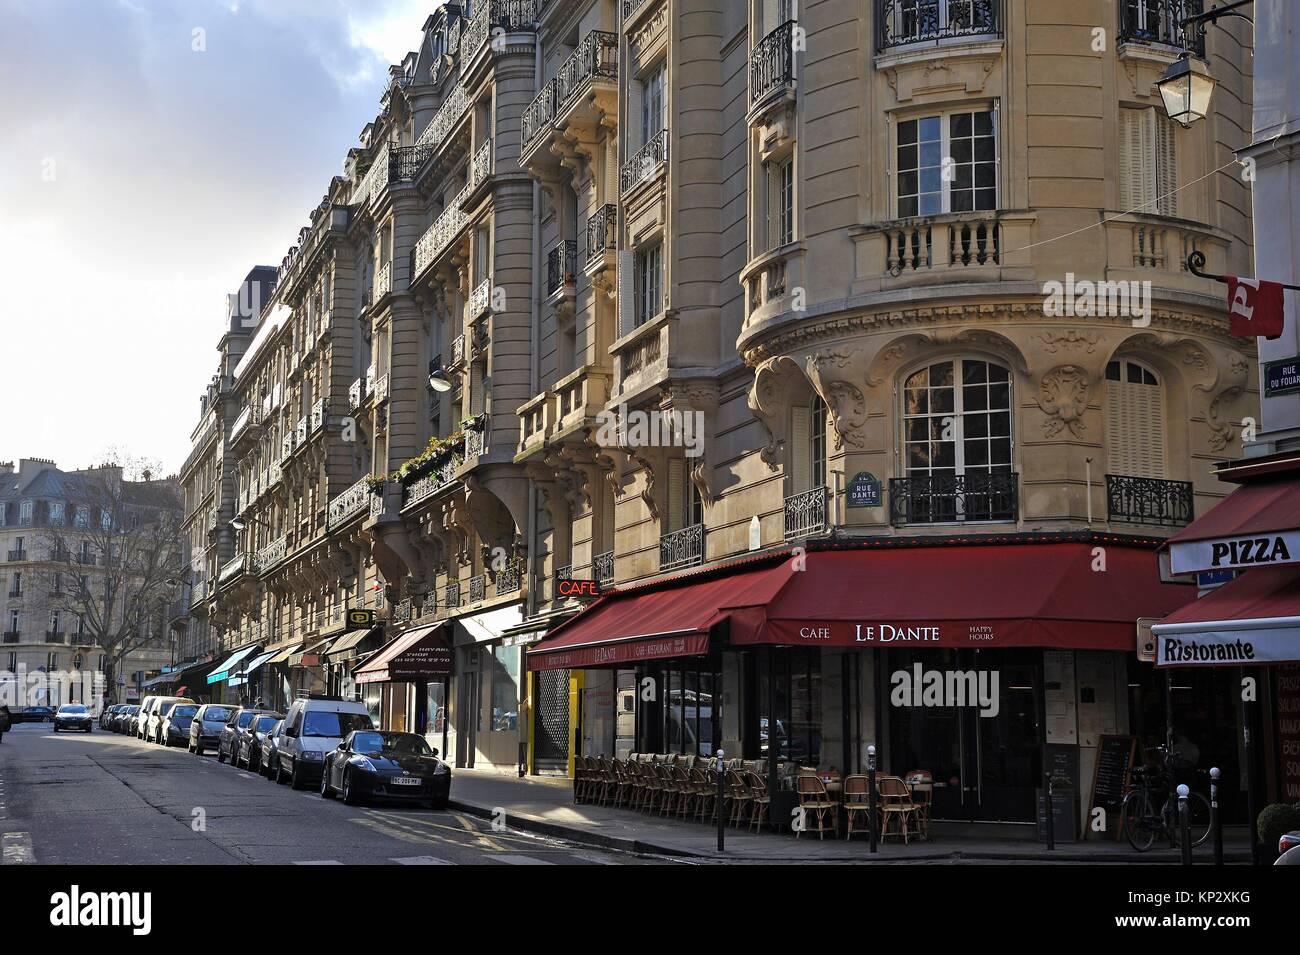 Rue Dante, 5th Arrondissement, Paris, France, Europe. - Stock Image